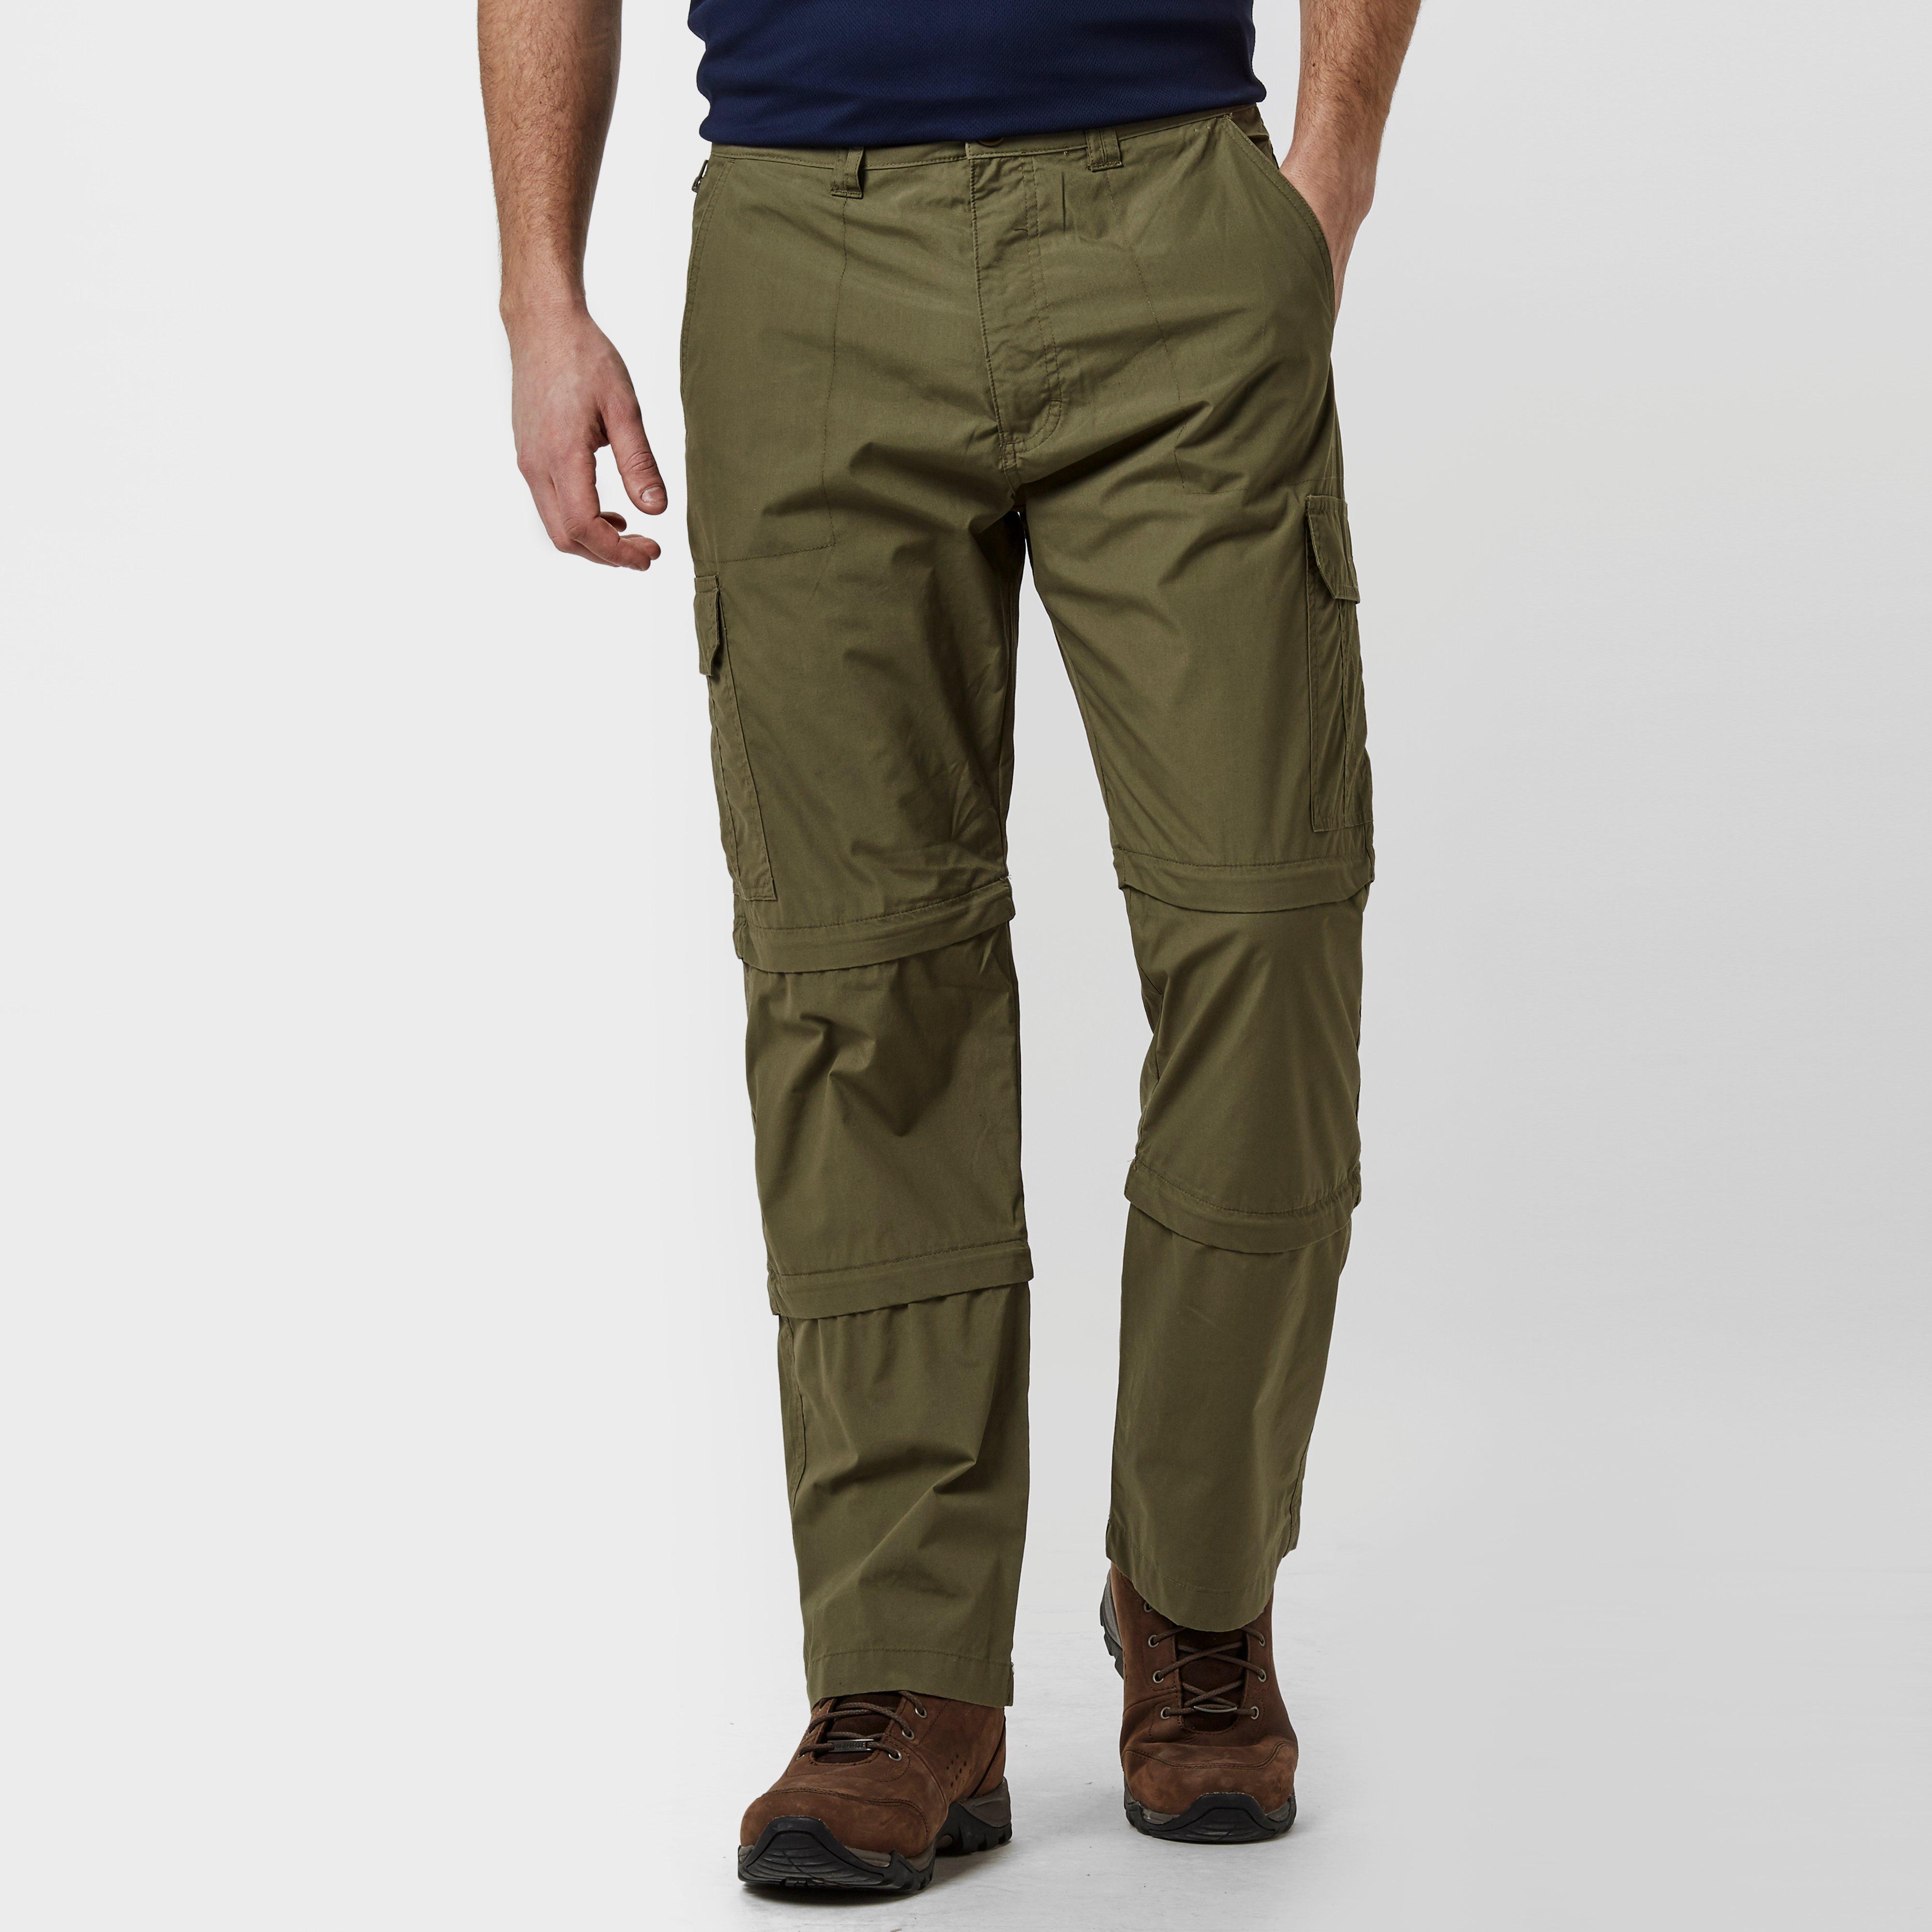 Peter Storm Mens Ramble Double ZipOff Trousers (Short) Khaki